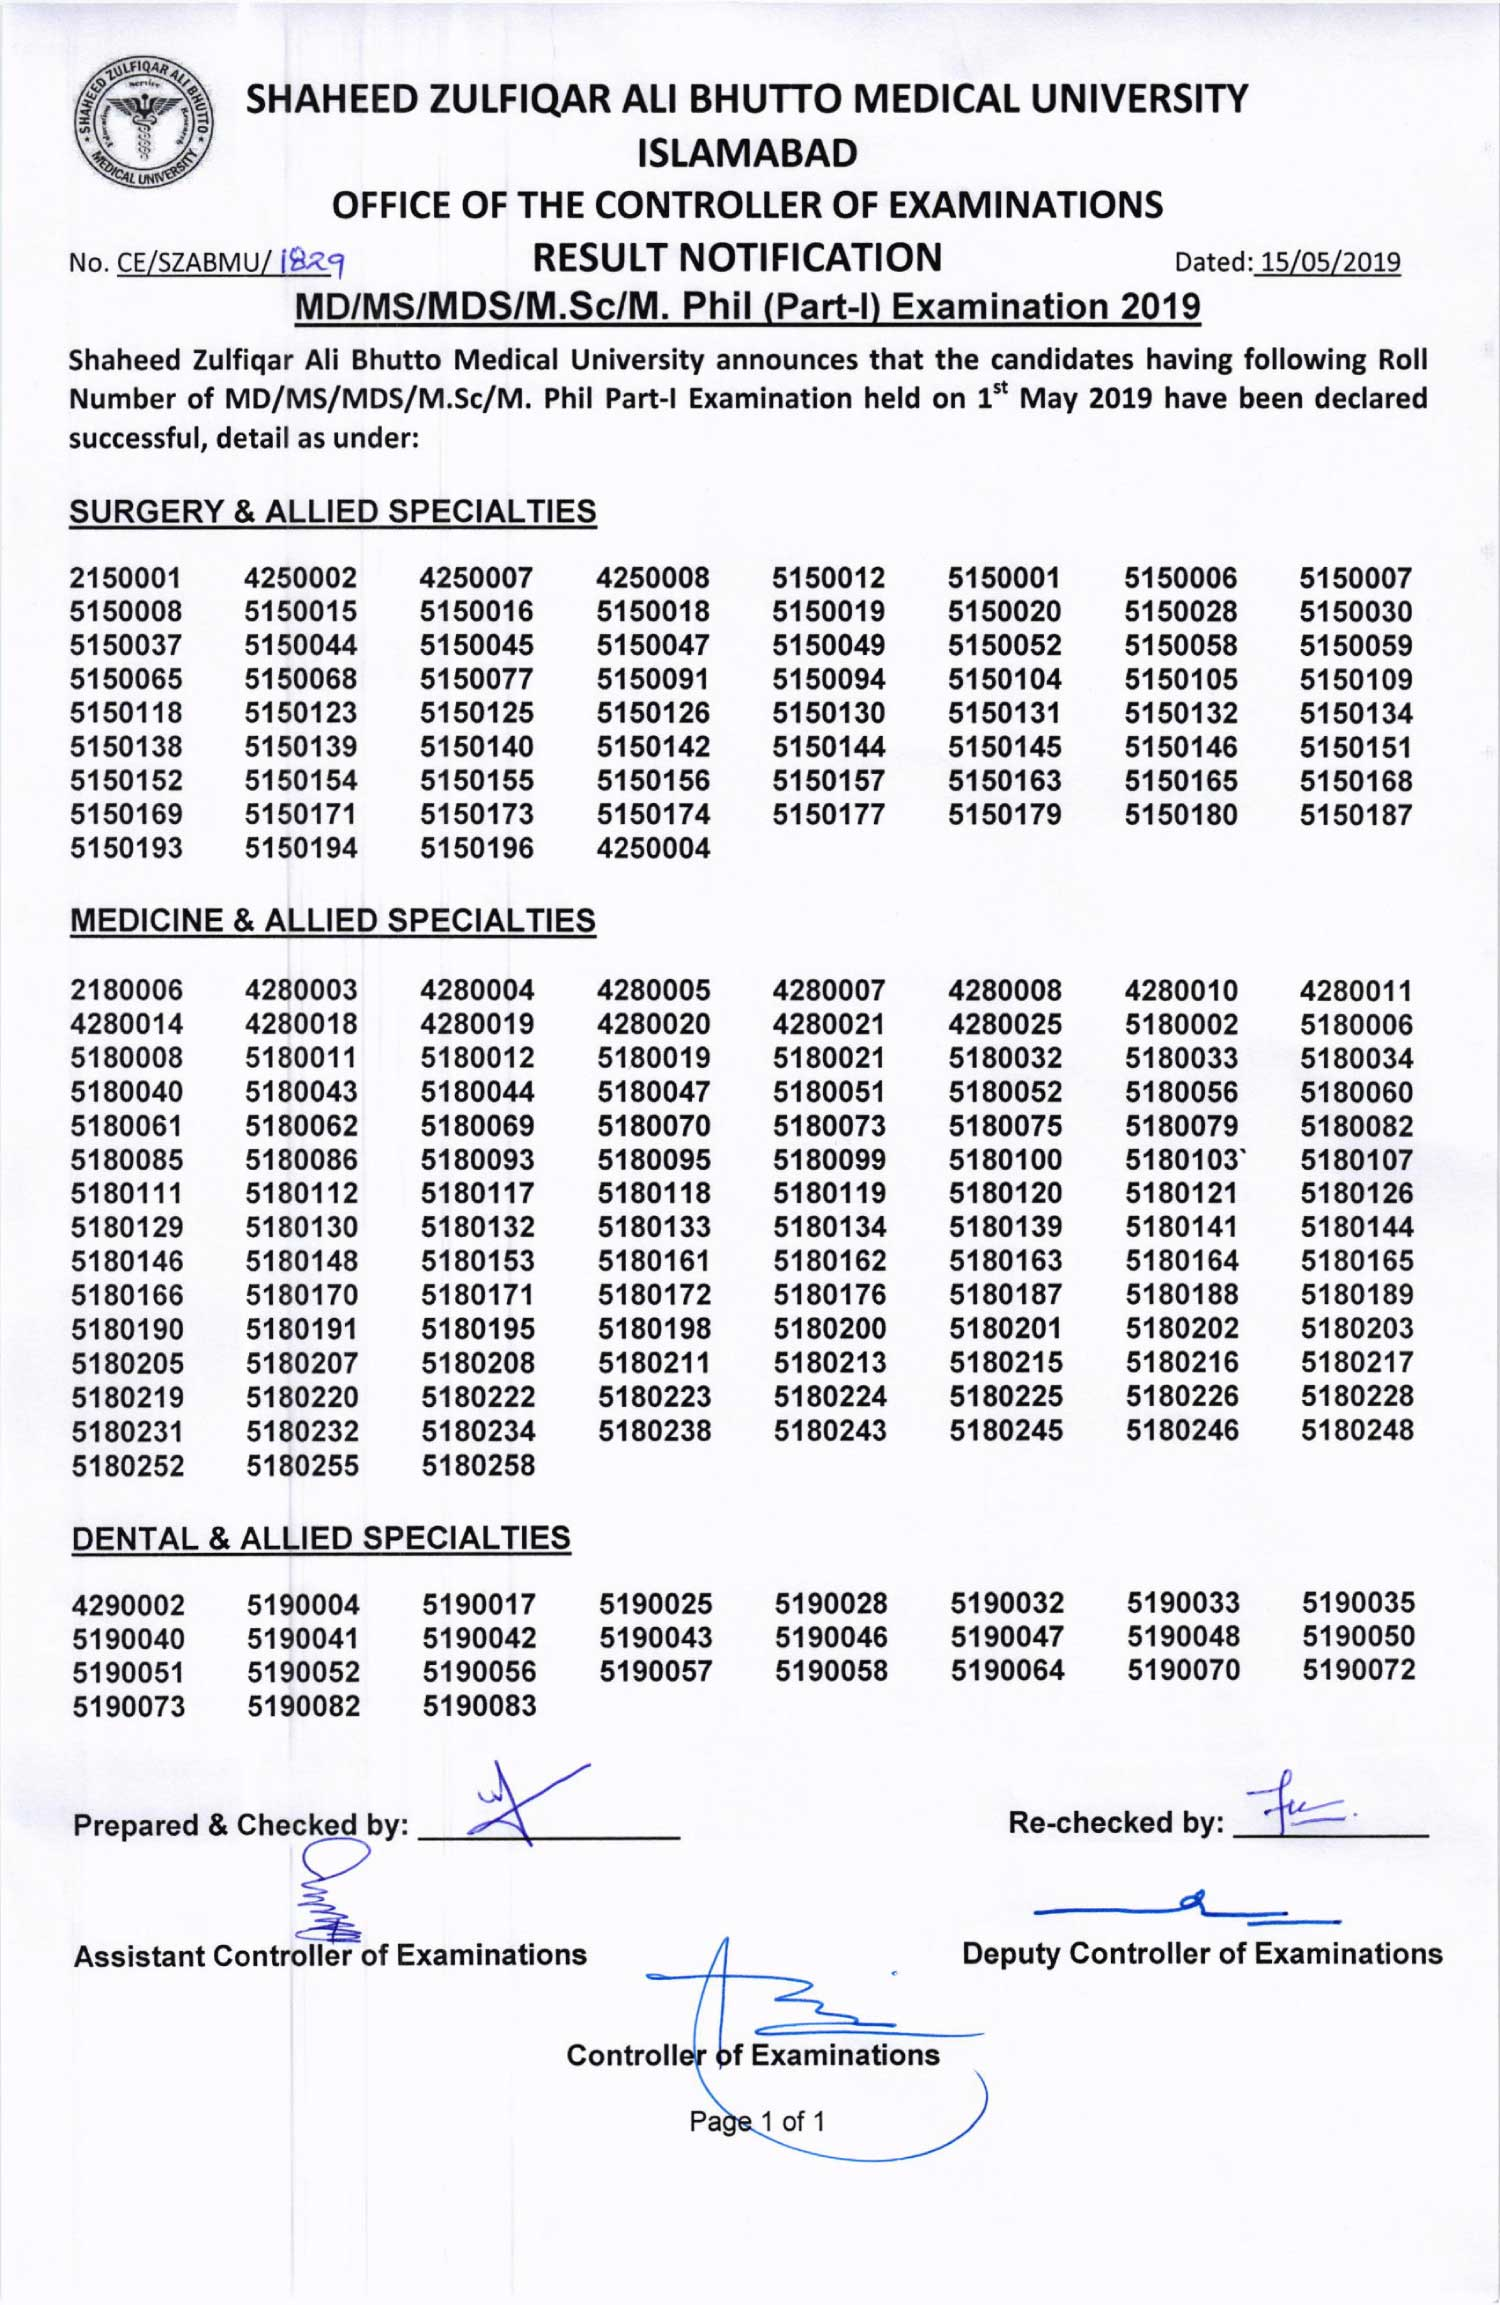 Result Notification of MD/MS/MDS/MSc/Mphil Part-1 Examinations April 2019